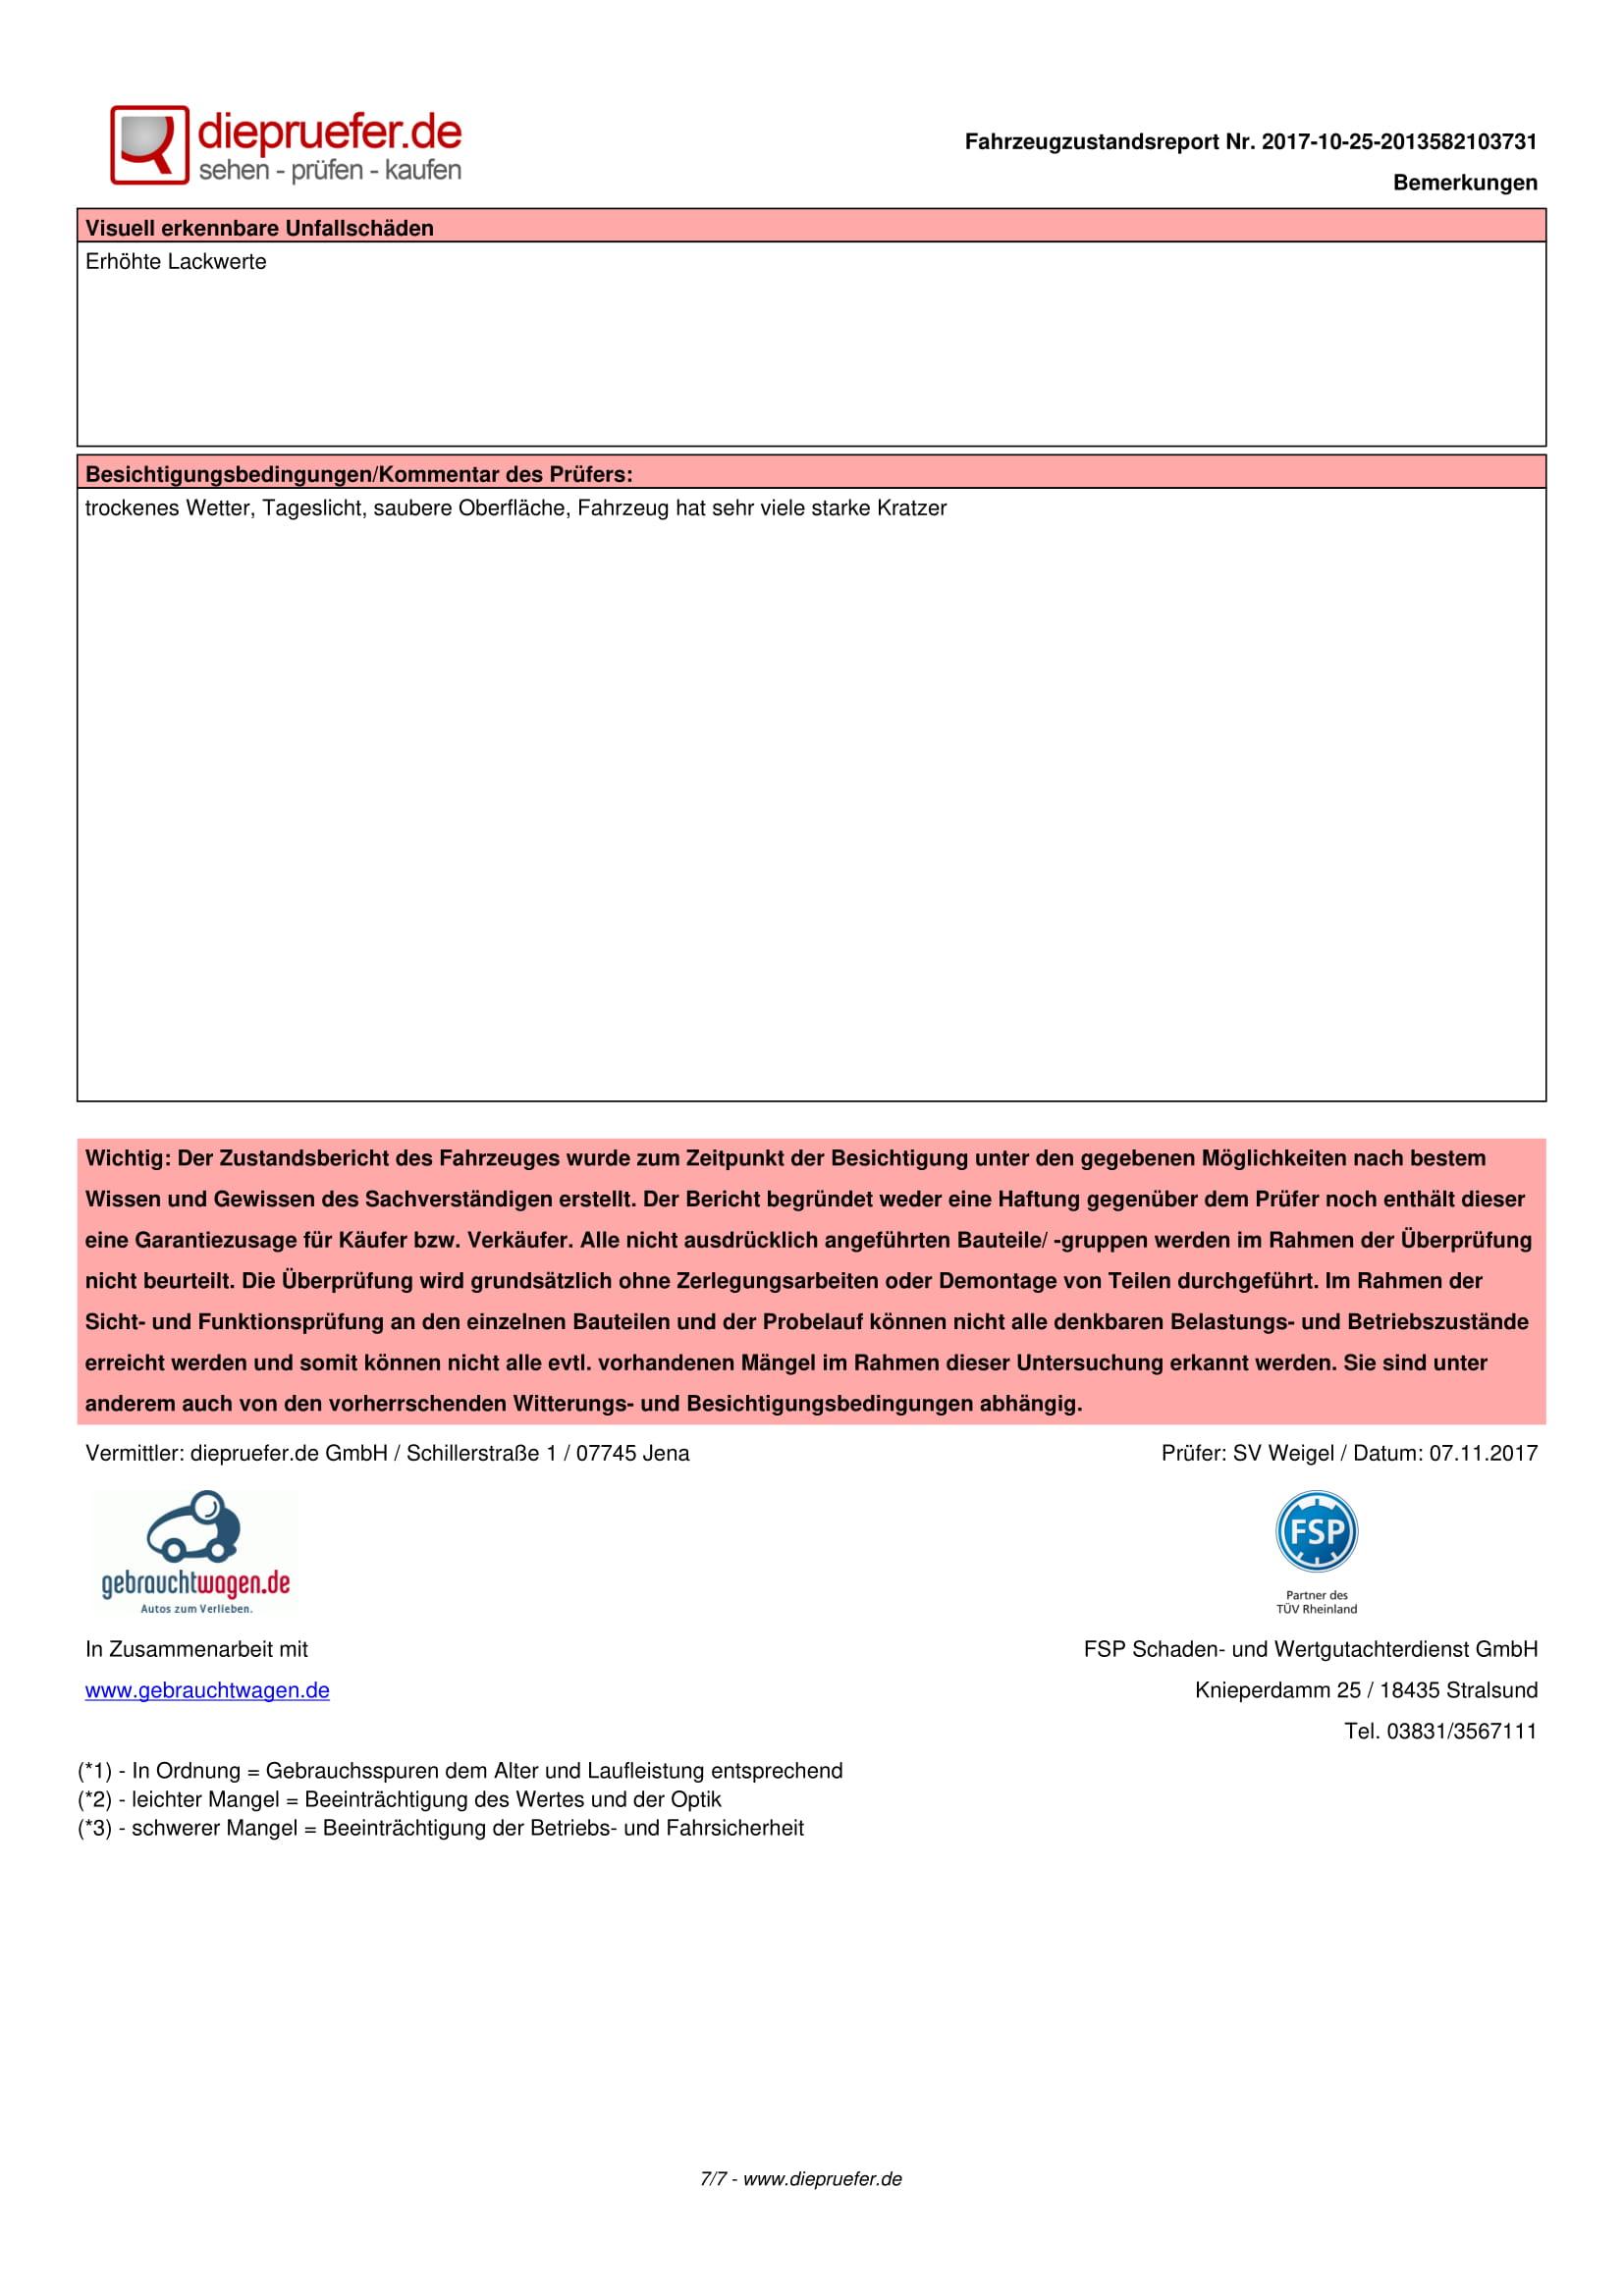 Протокол проверка на употребяван автомобил - Opel Insignia Kombi-7